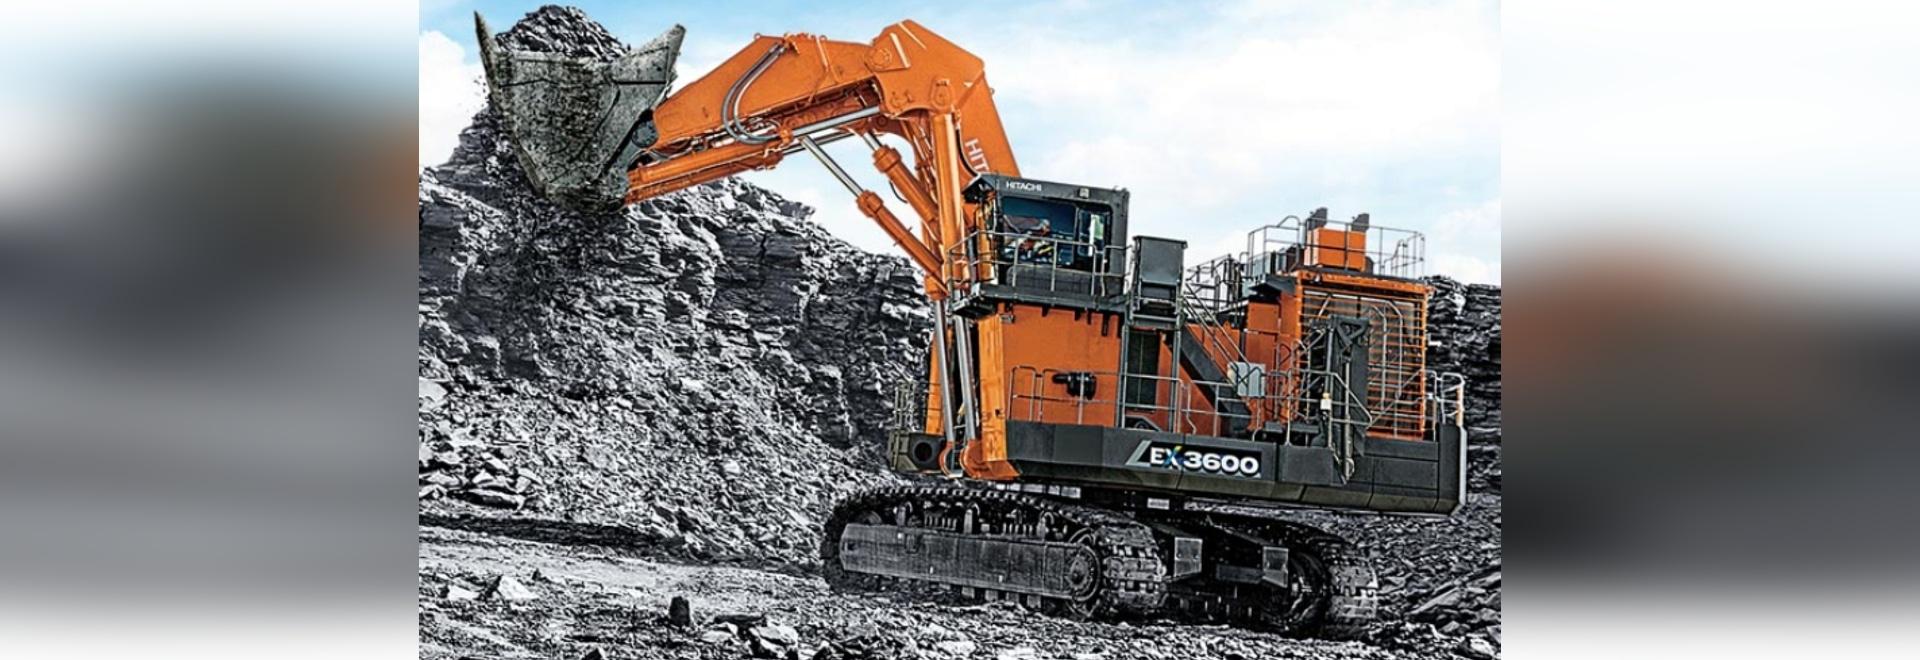 EX3600-7 Bergbau-Bagger und -Schaufel